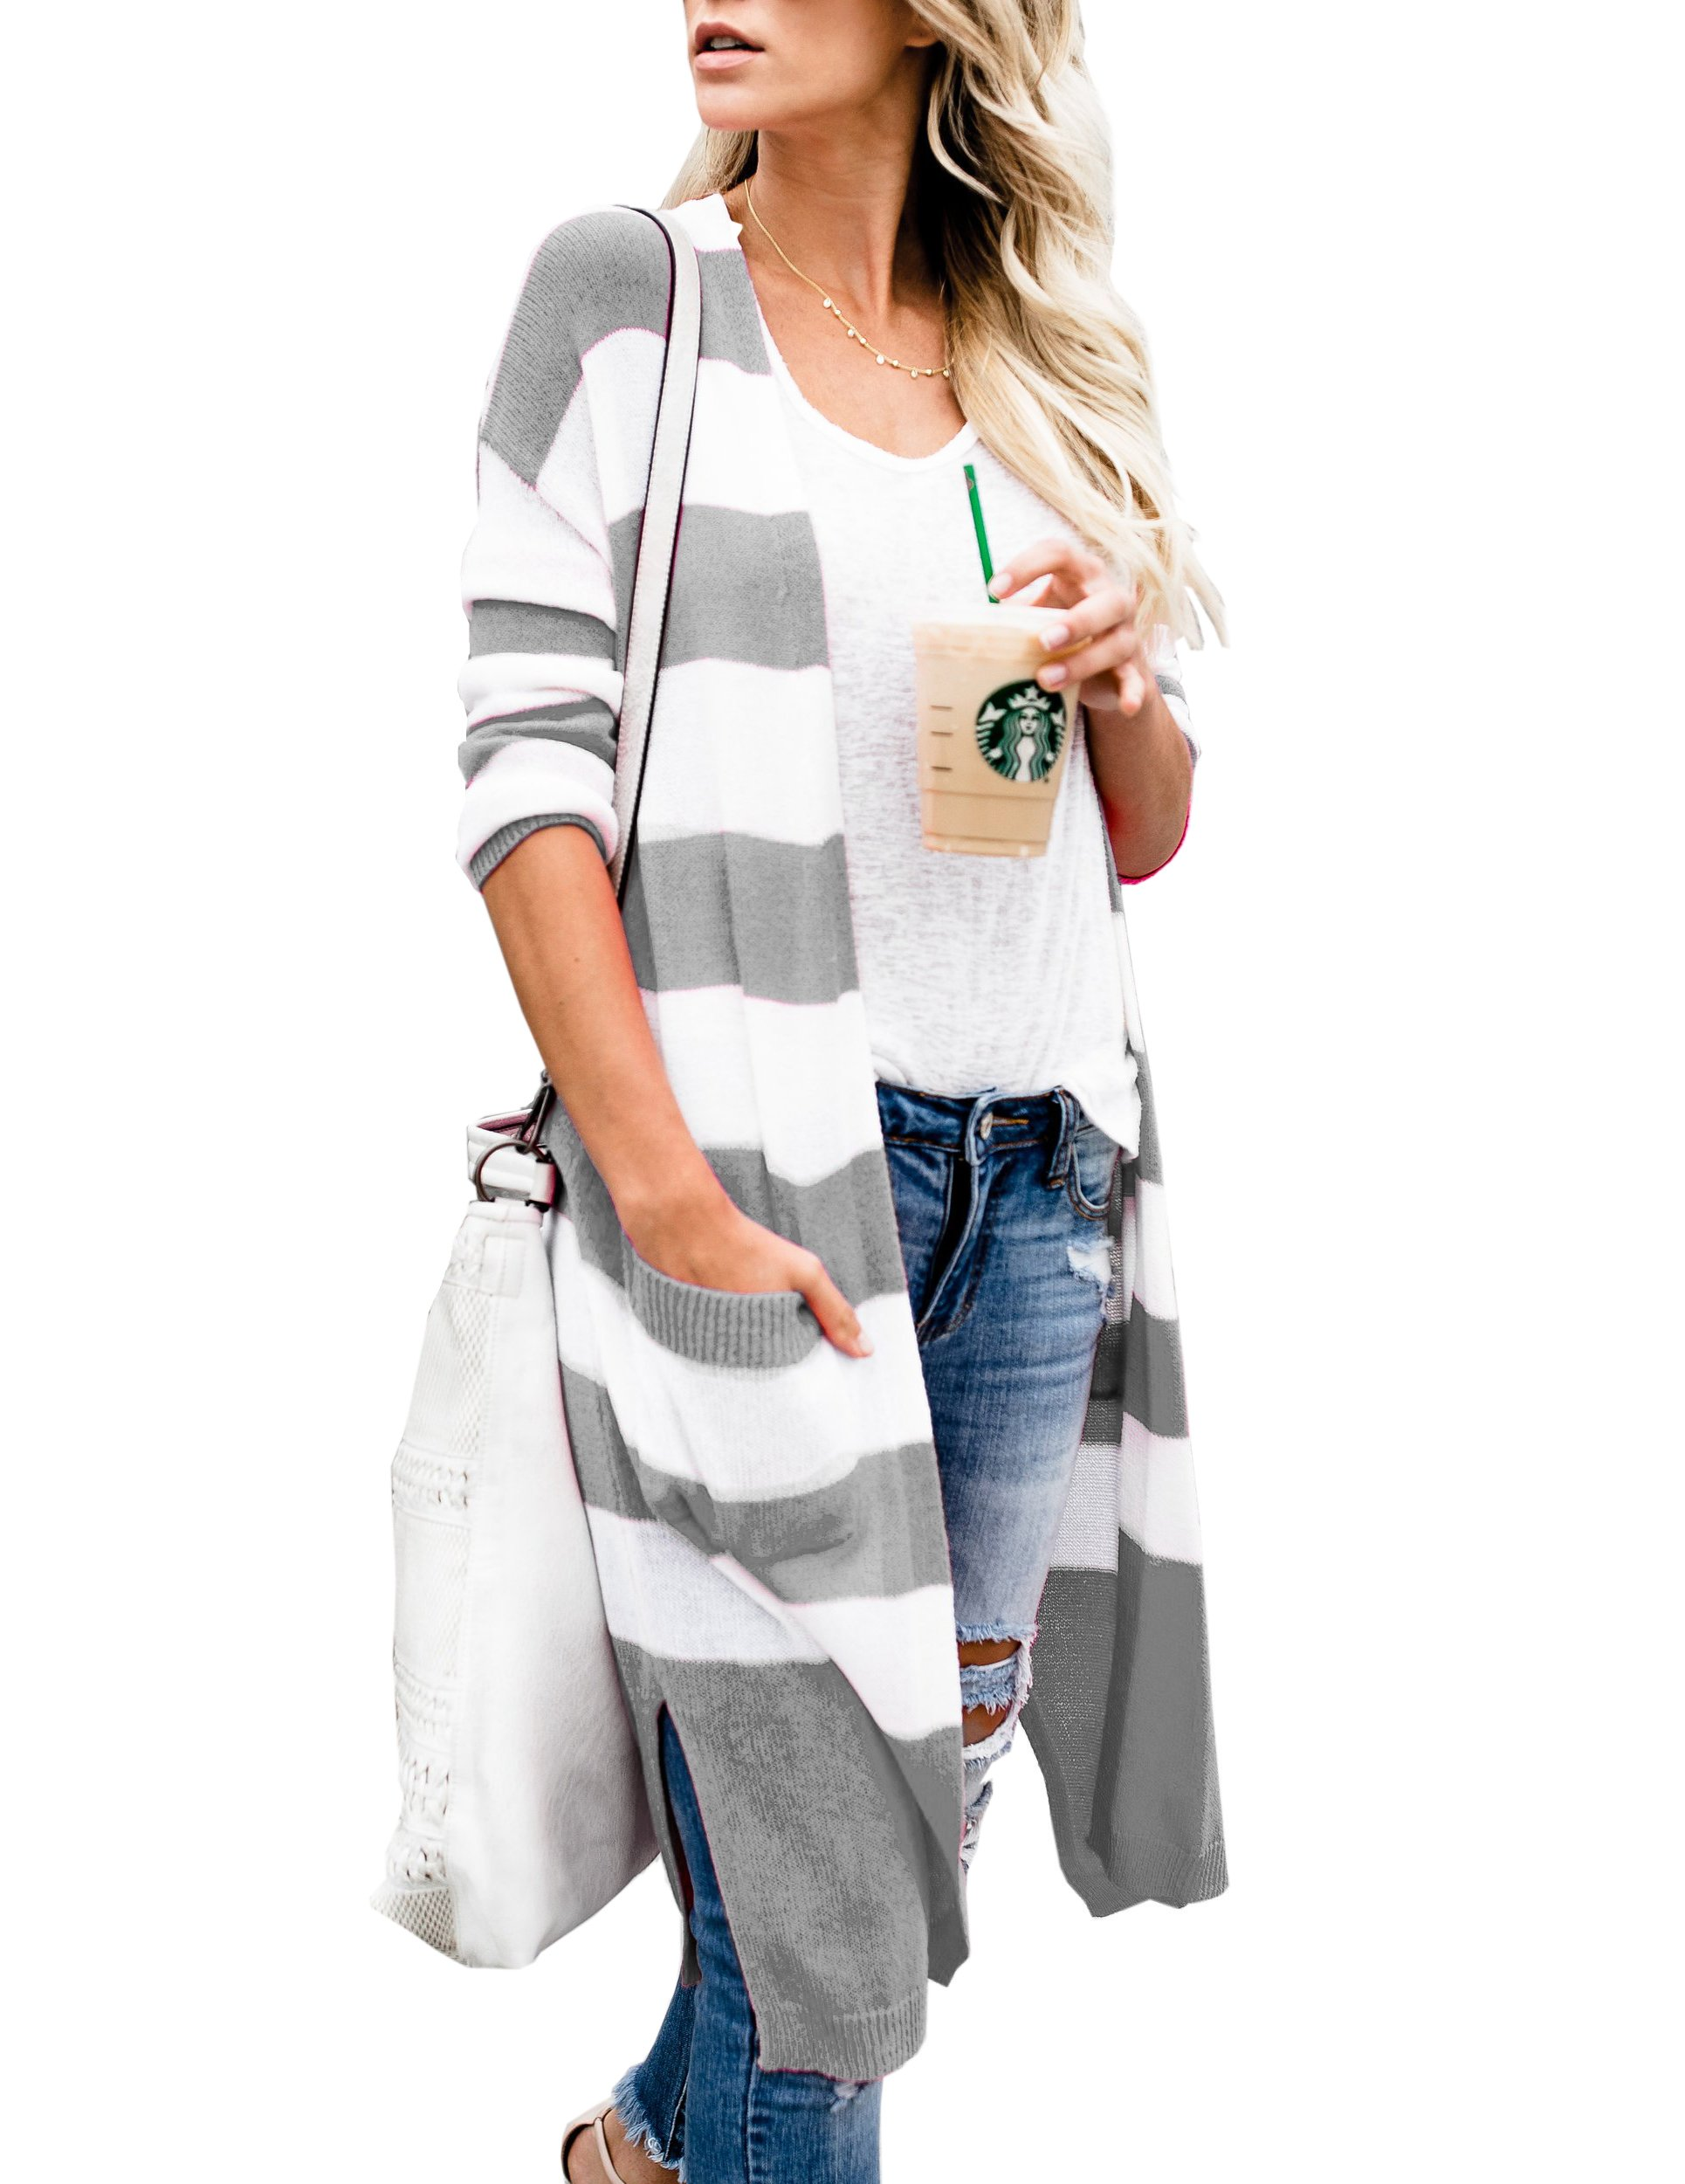 Niitawm Womens Casual Striped Pockets Cardigans Long Sleeve Knit Lightweight Open Front Cardigan Sweater (L,Light Grey)